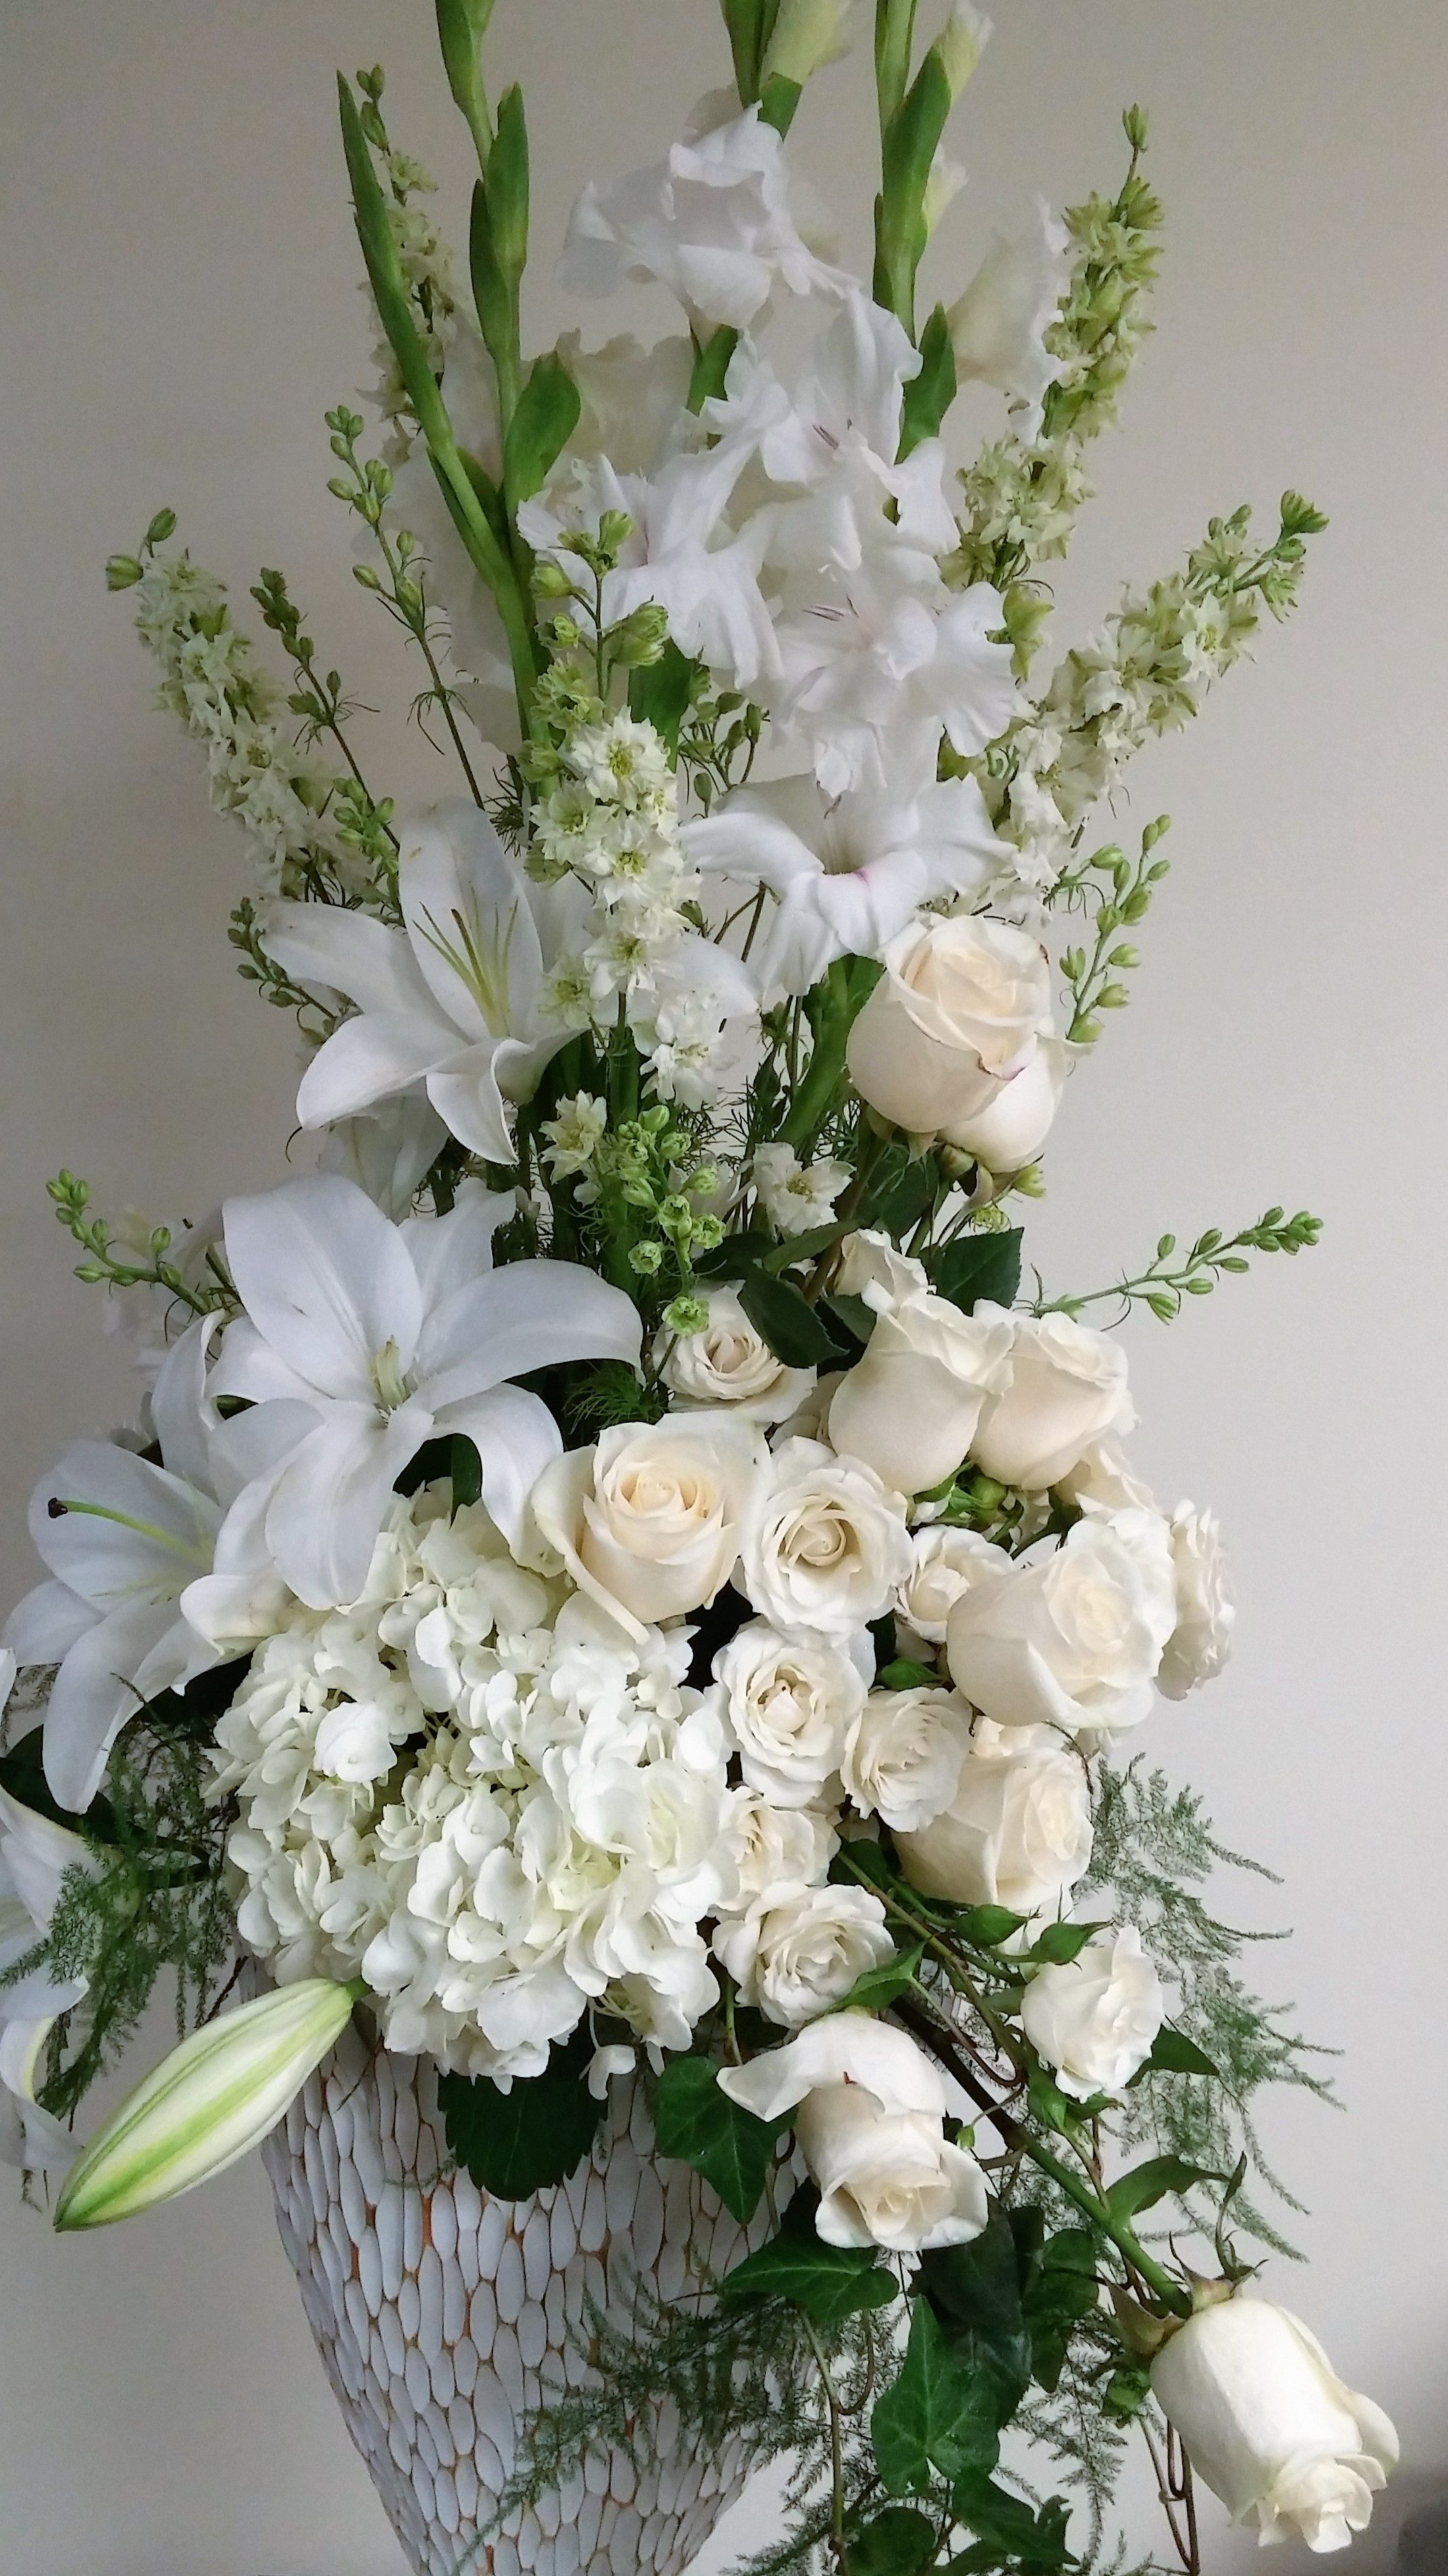 Tall White Arrangement White Gladiolus White Oriental Lilies White Roses W Large Flower Arrangements Funeral Flower Arrangements Church Flower Arrangements